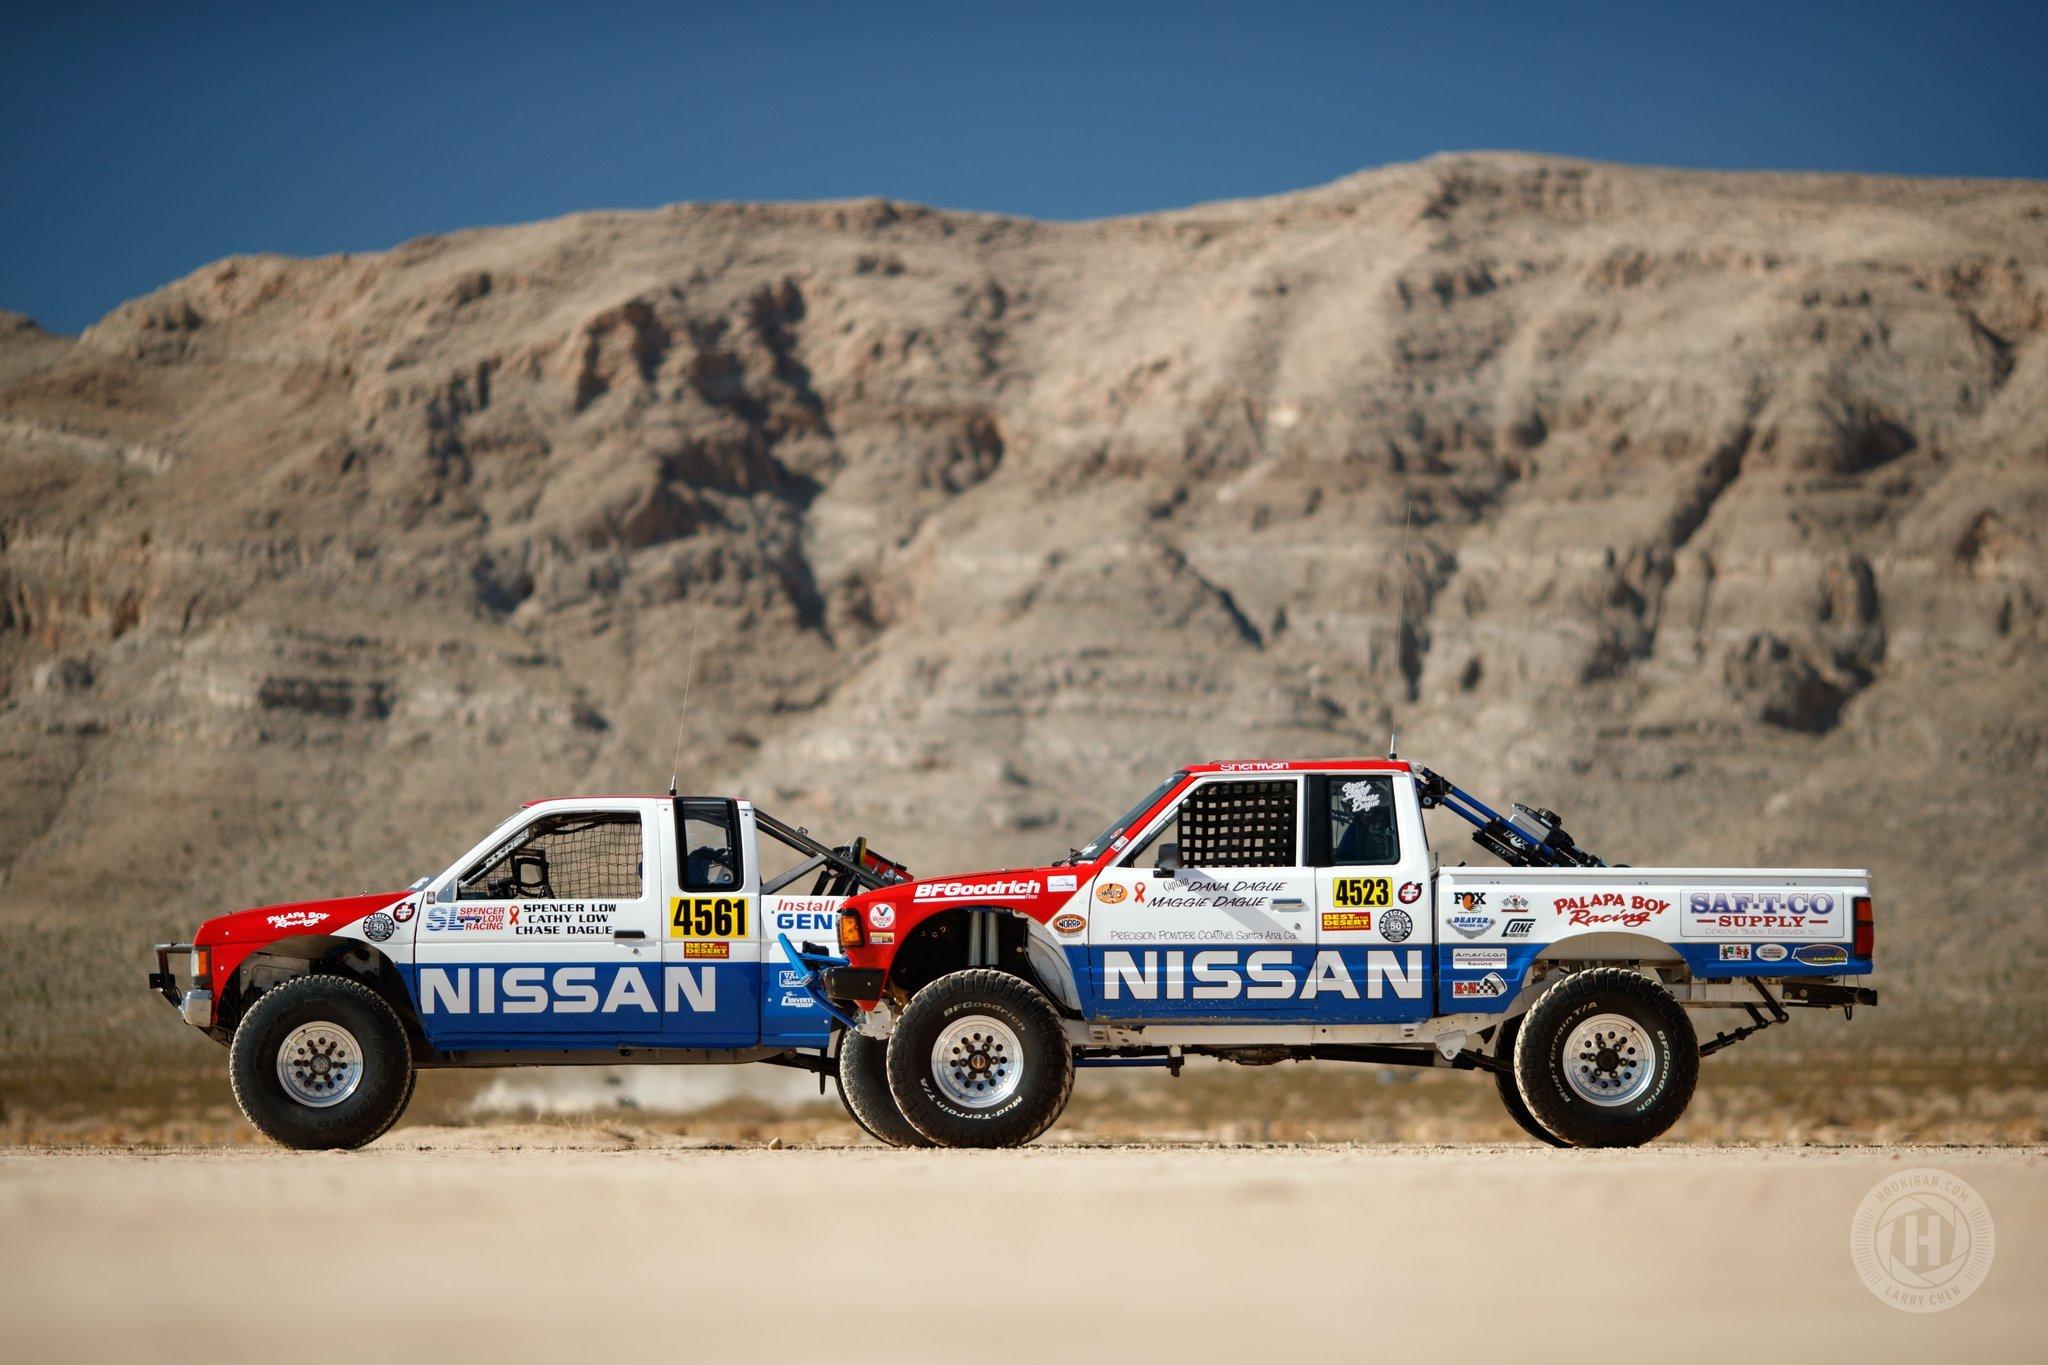 Larry_Chen_2018_Hoonigan_Nissan-Hardbody-Trucks_01_2048x.jpeg